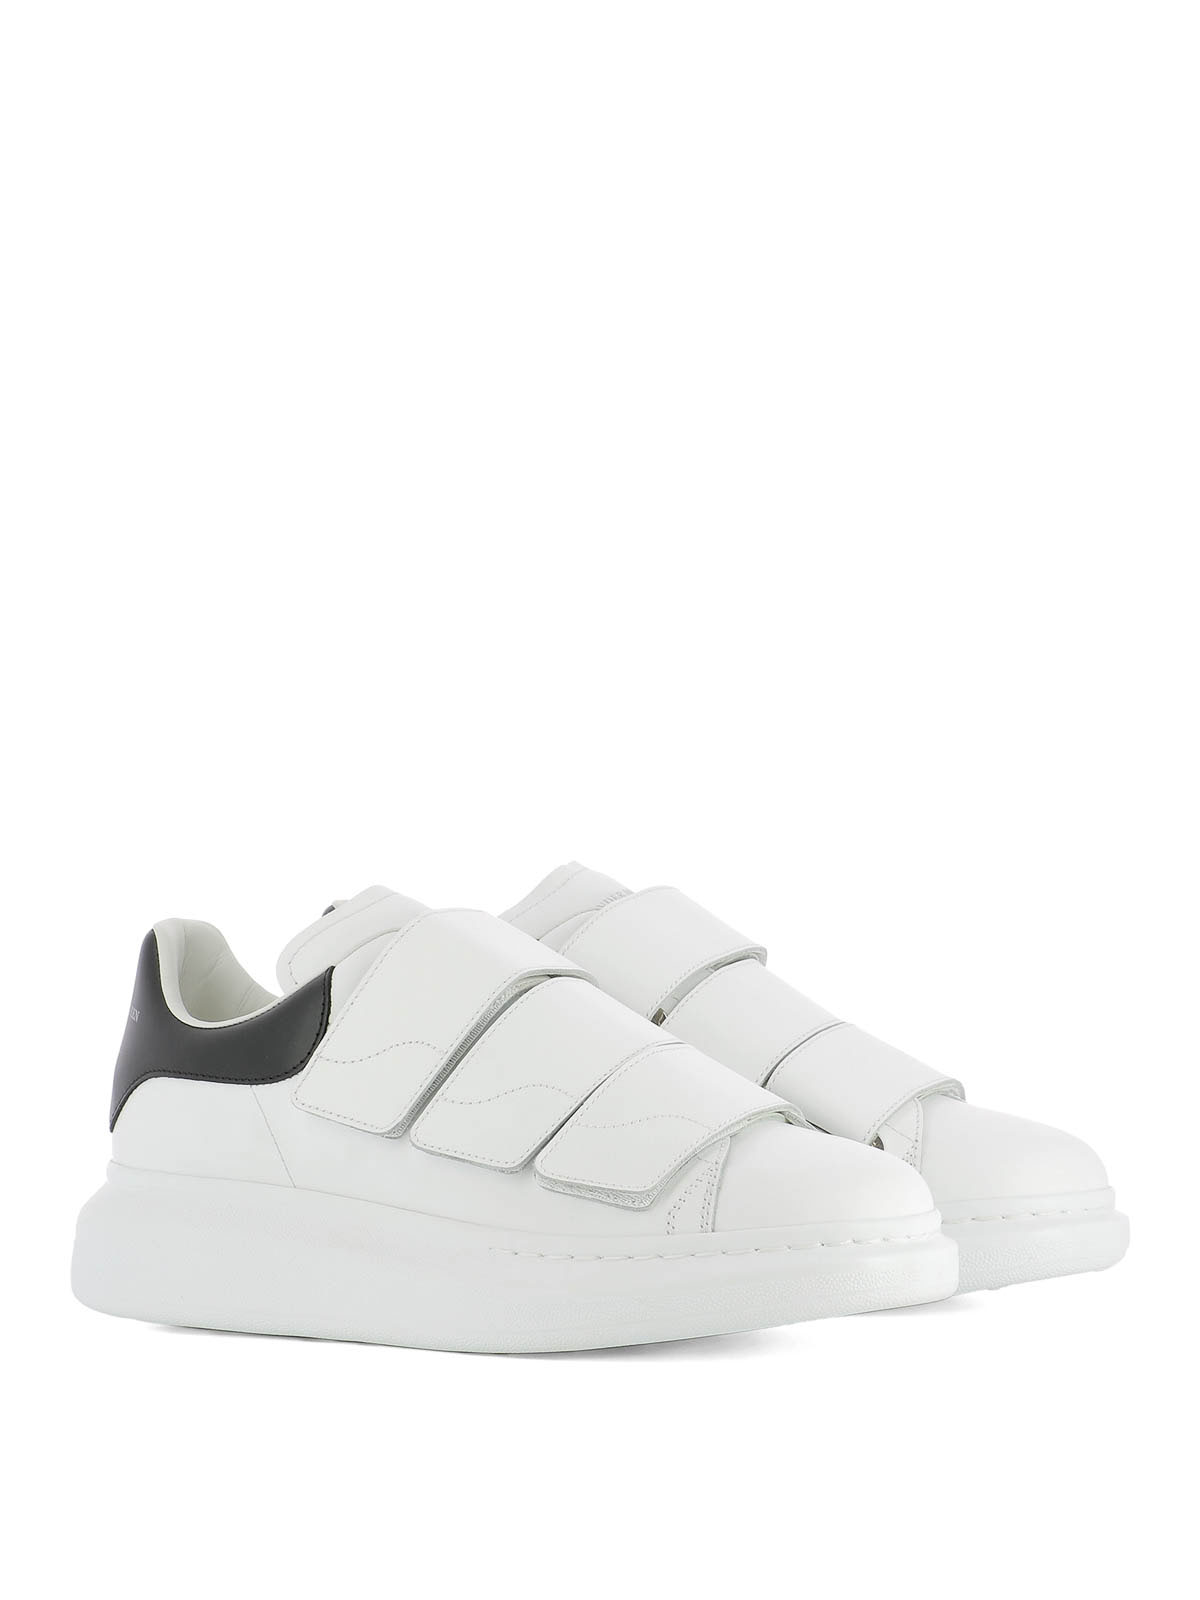 e219586a34f6 ALEXANDER MCQUEEN  trainers online - Oversize velcro strap sneakers